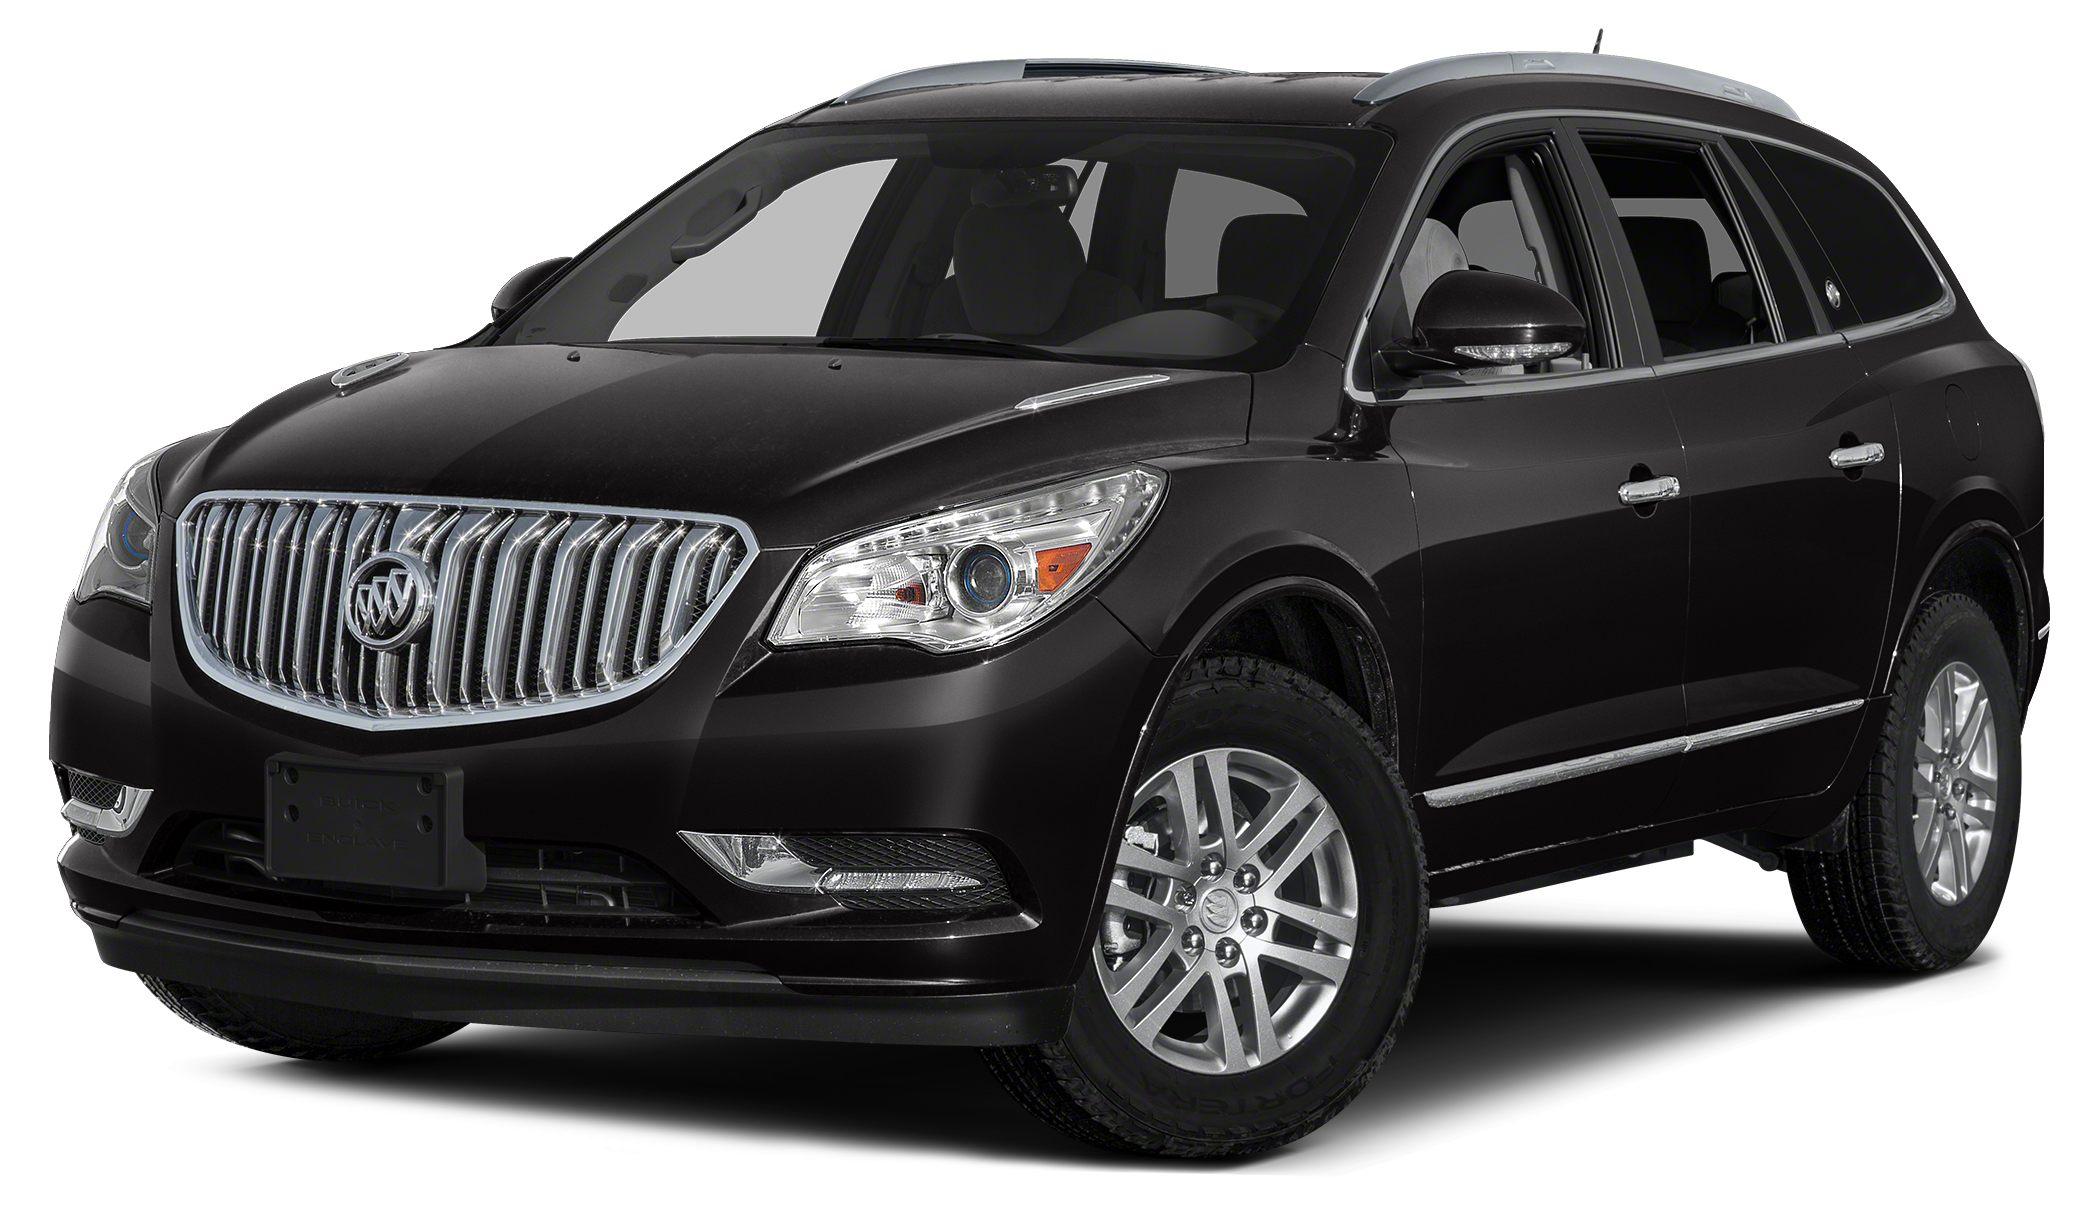 2014 Buick Enclave Premium Excellent Condition GREAT MILES 16527 Premium trim 1700 below Kel